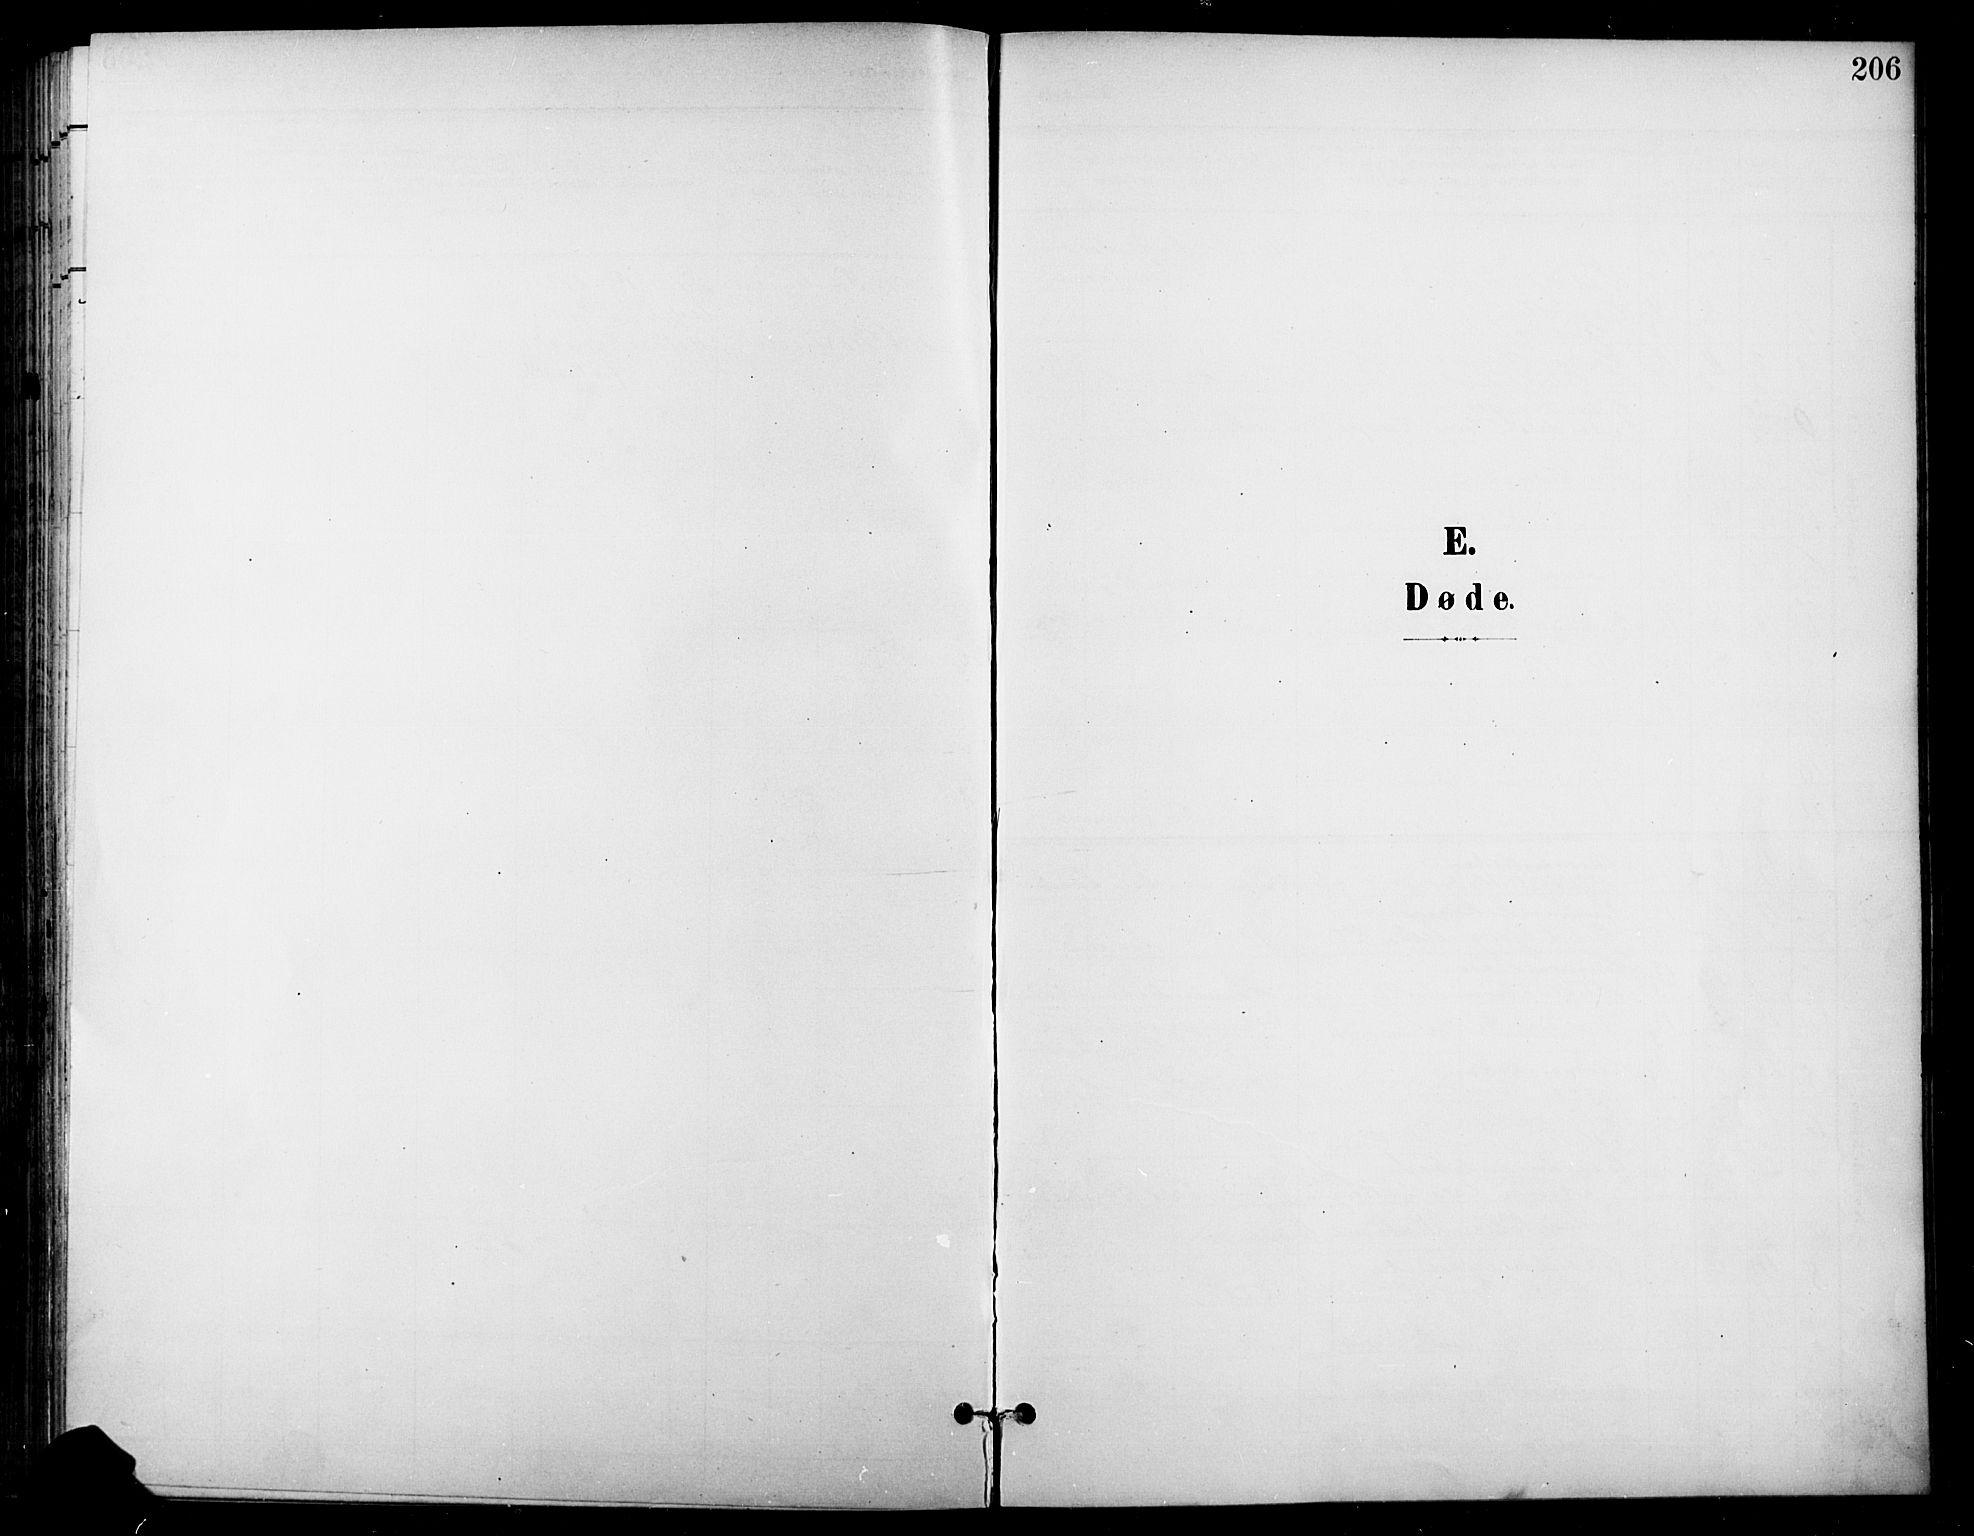 SAH, Gran prestekontor, Ministerialbok nr. 19, 1898-1907, s. 206